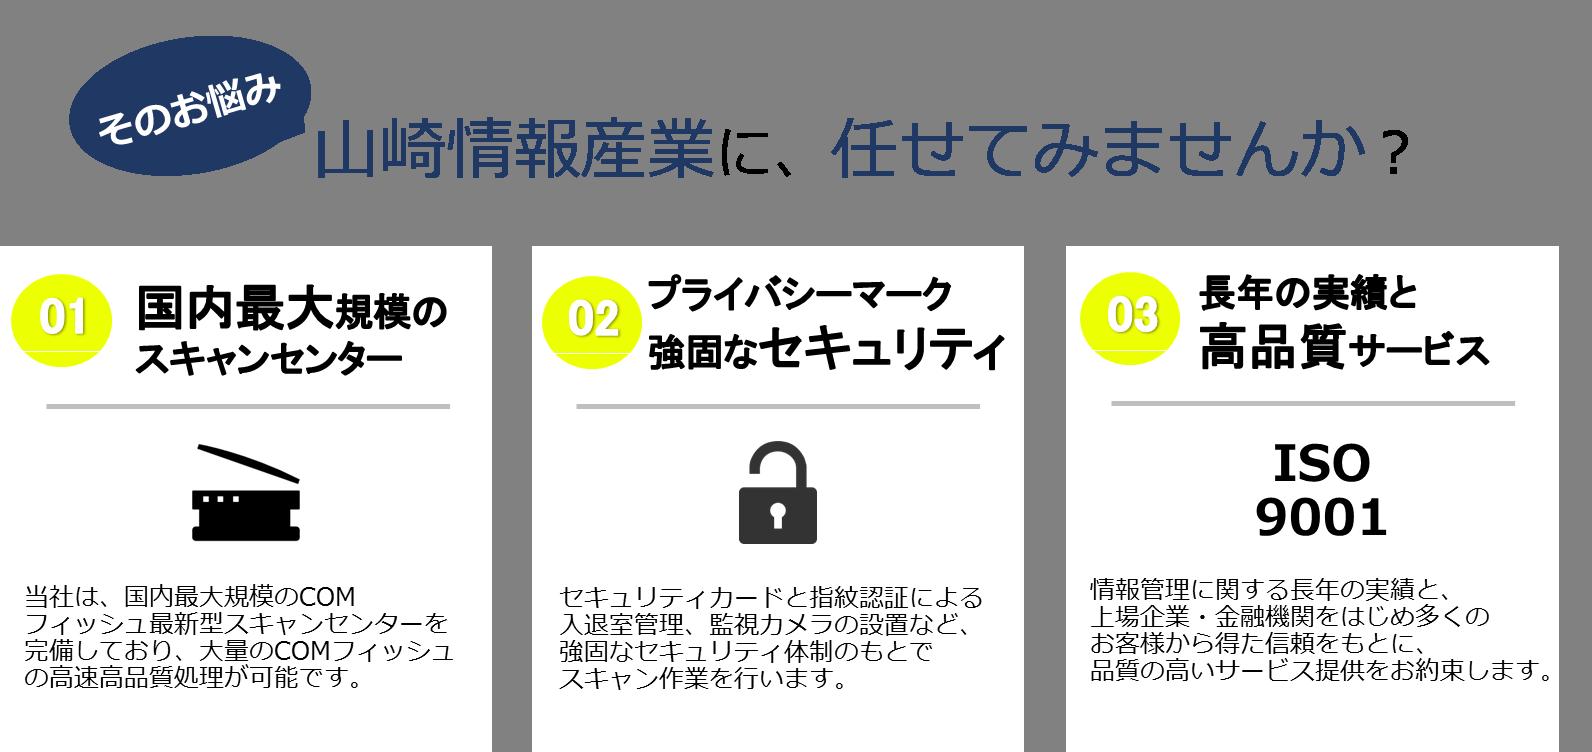 test tsuyomi3.png